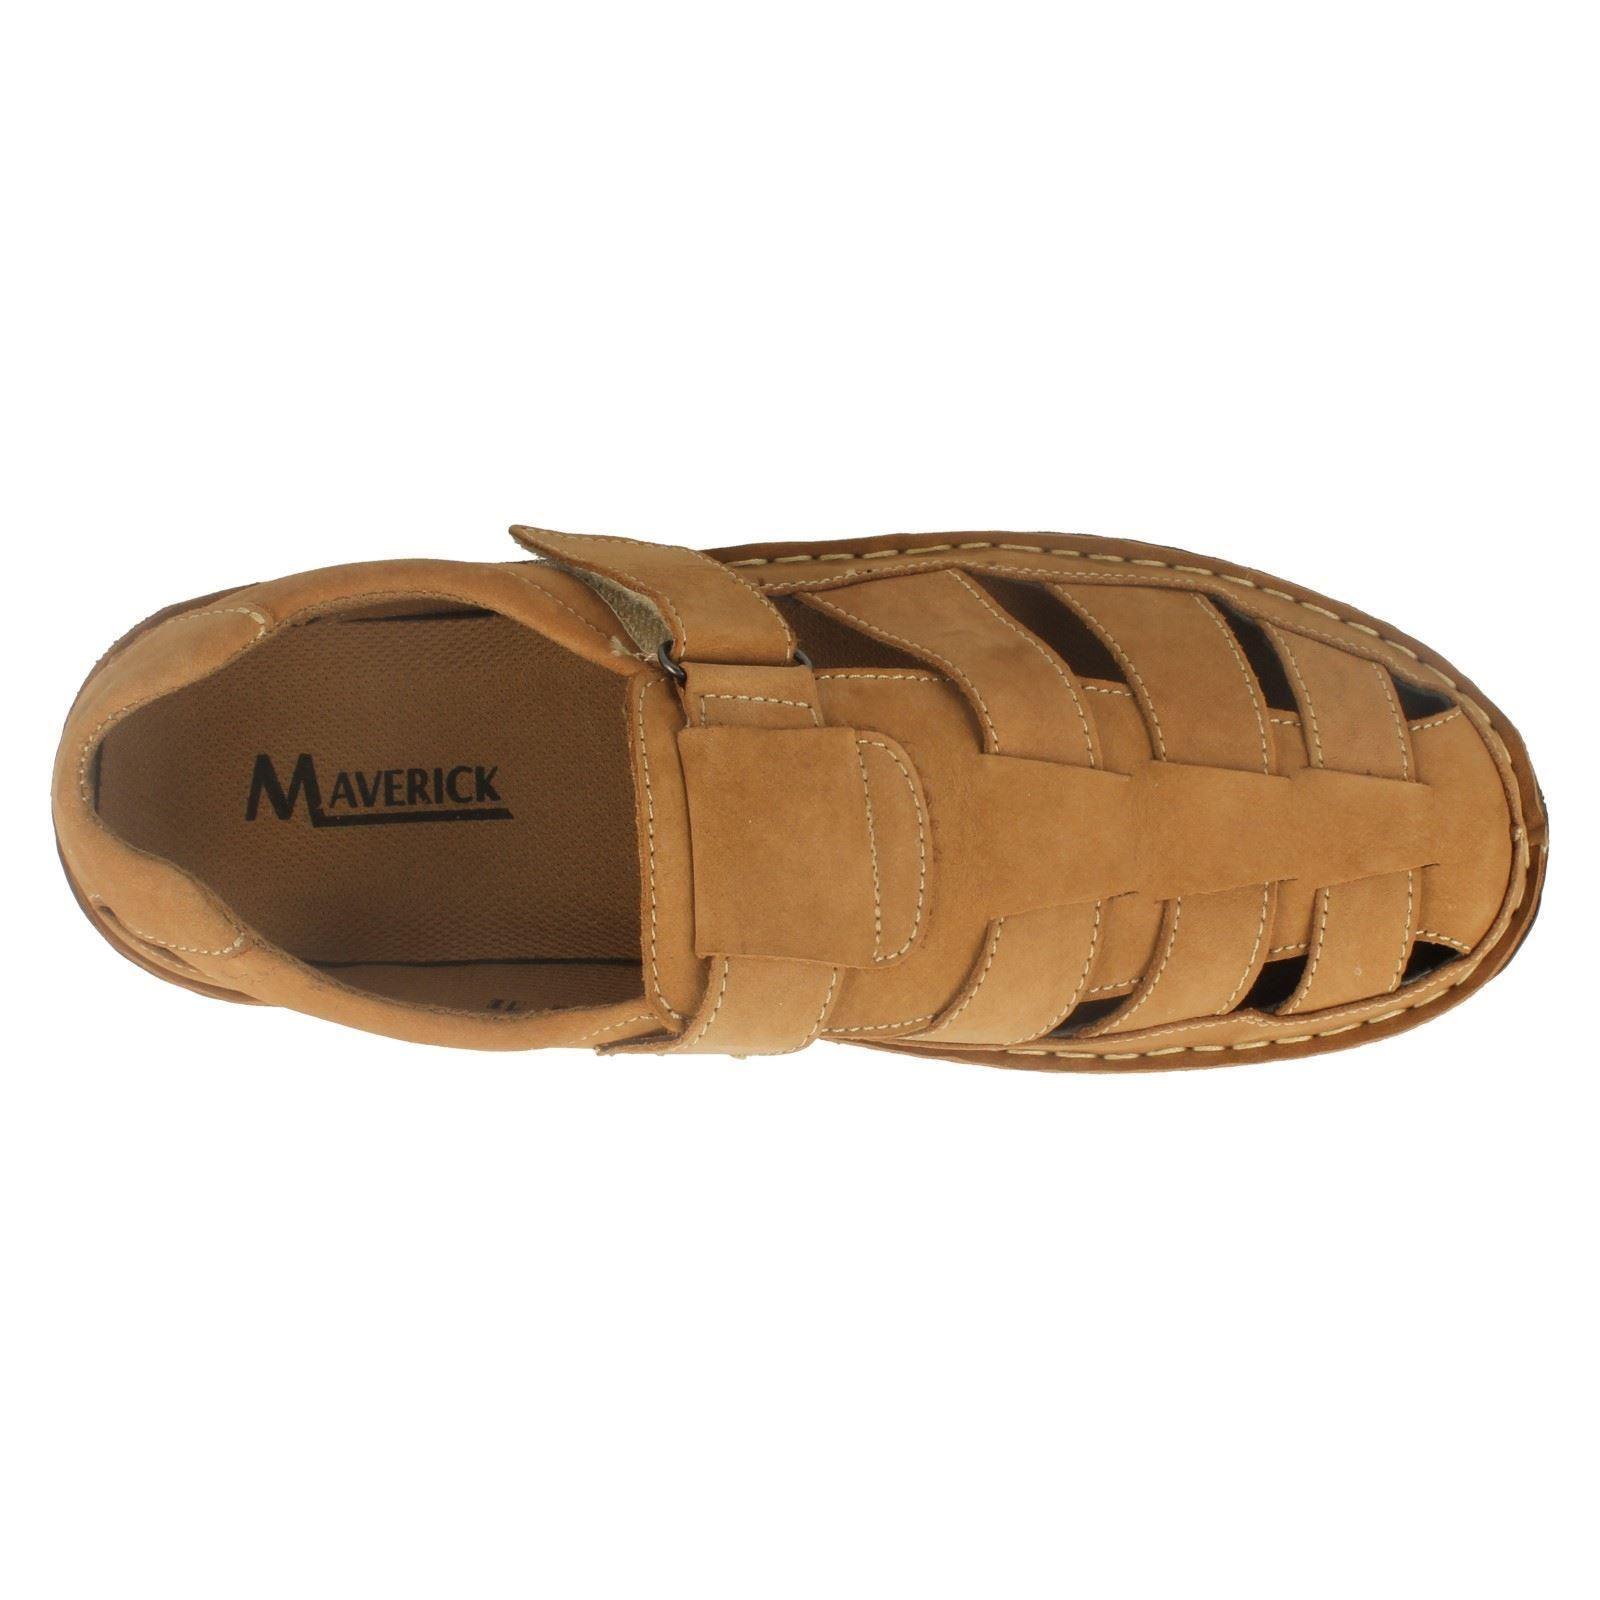 d51f9dd6af0f Mens Maverick Closed Toe Leather Sandals Shoes Label A1103